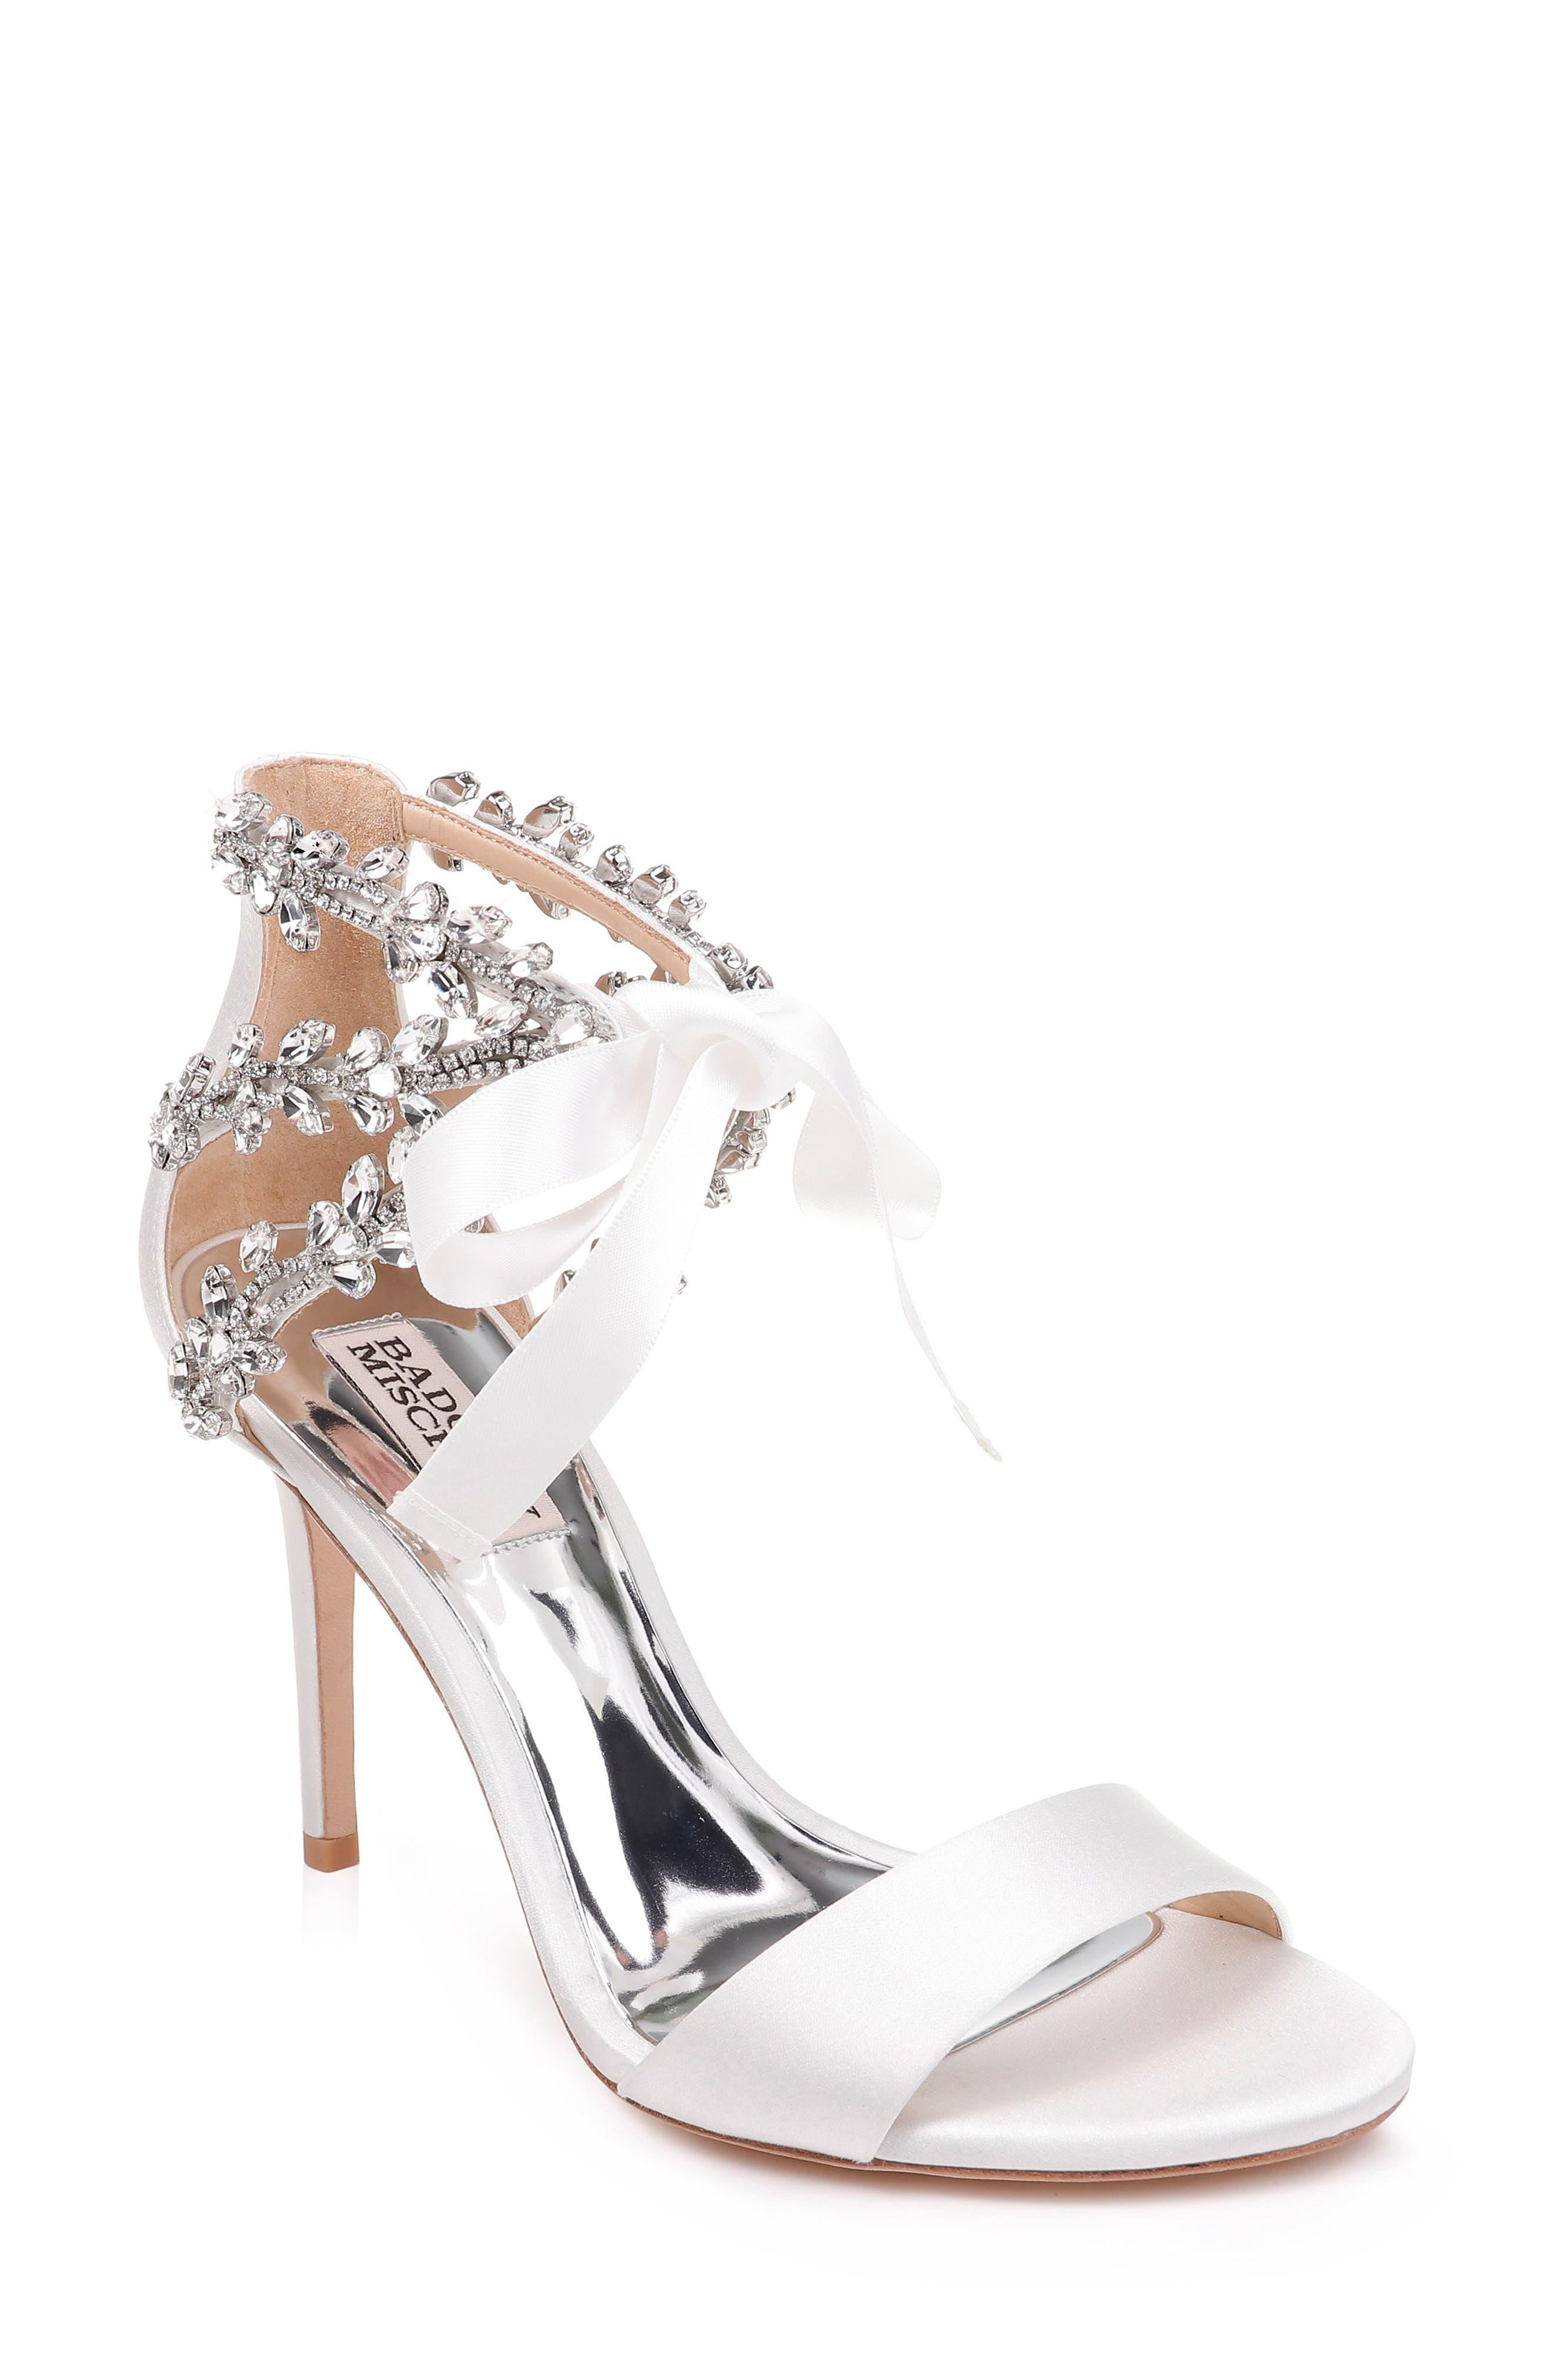 a6b4d01520c0 Badgley Mischka Felicia Embellished Sandal